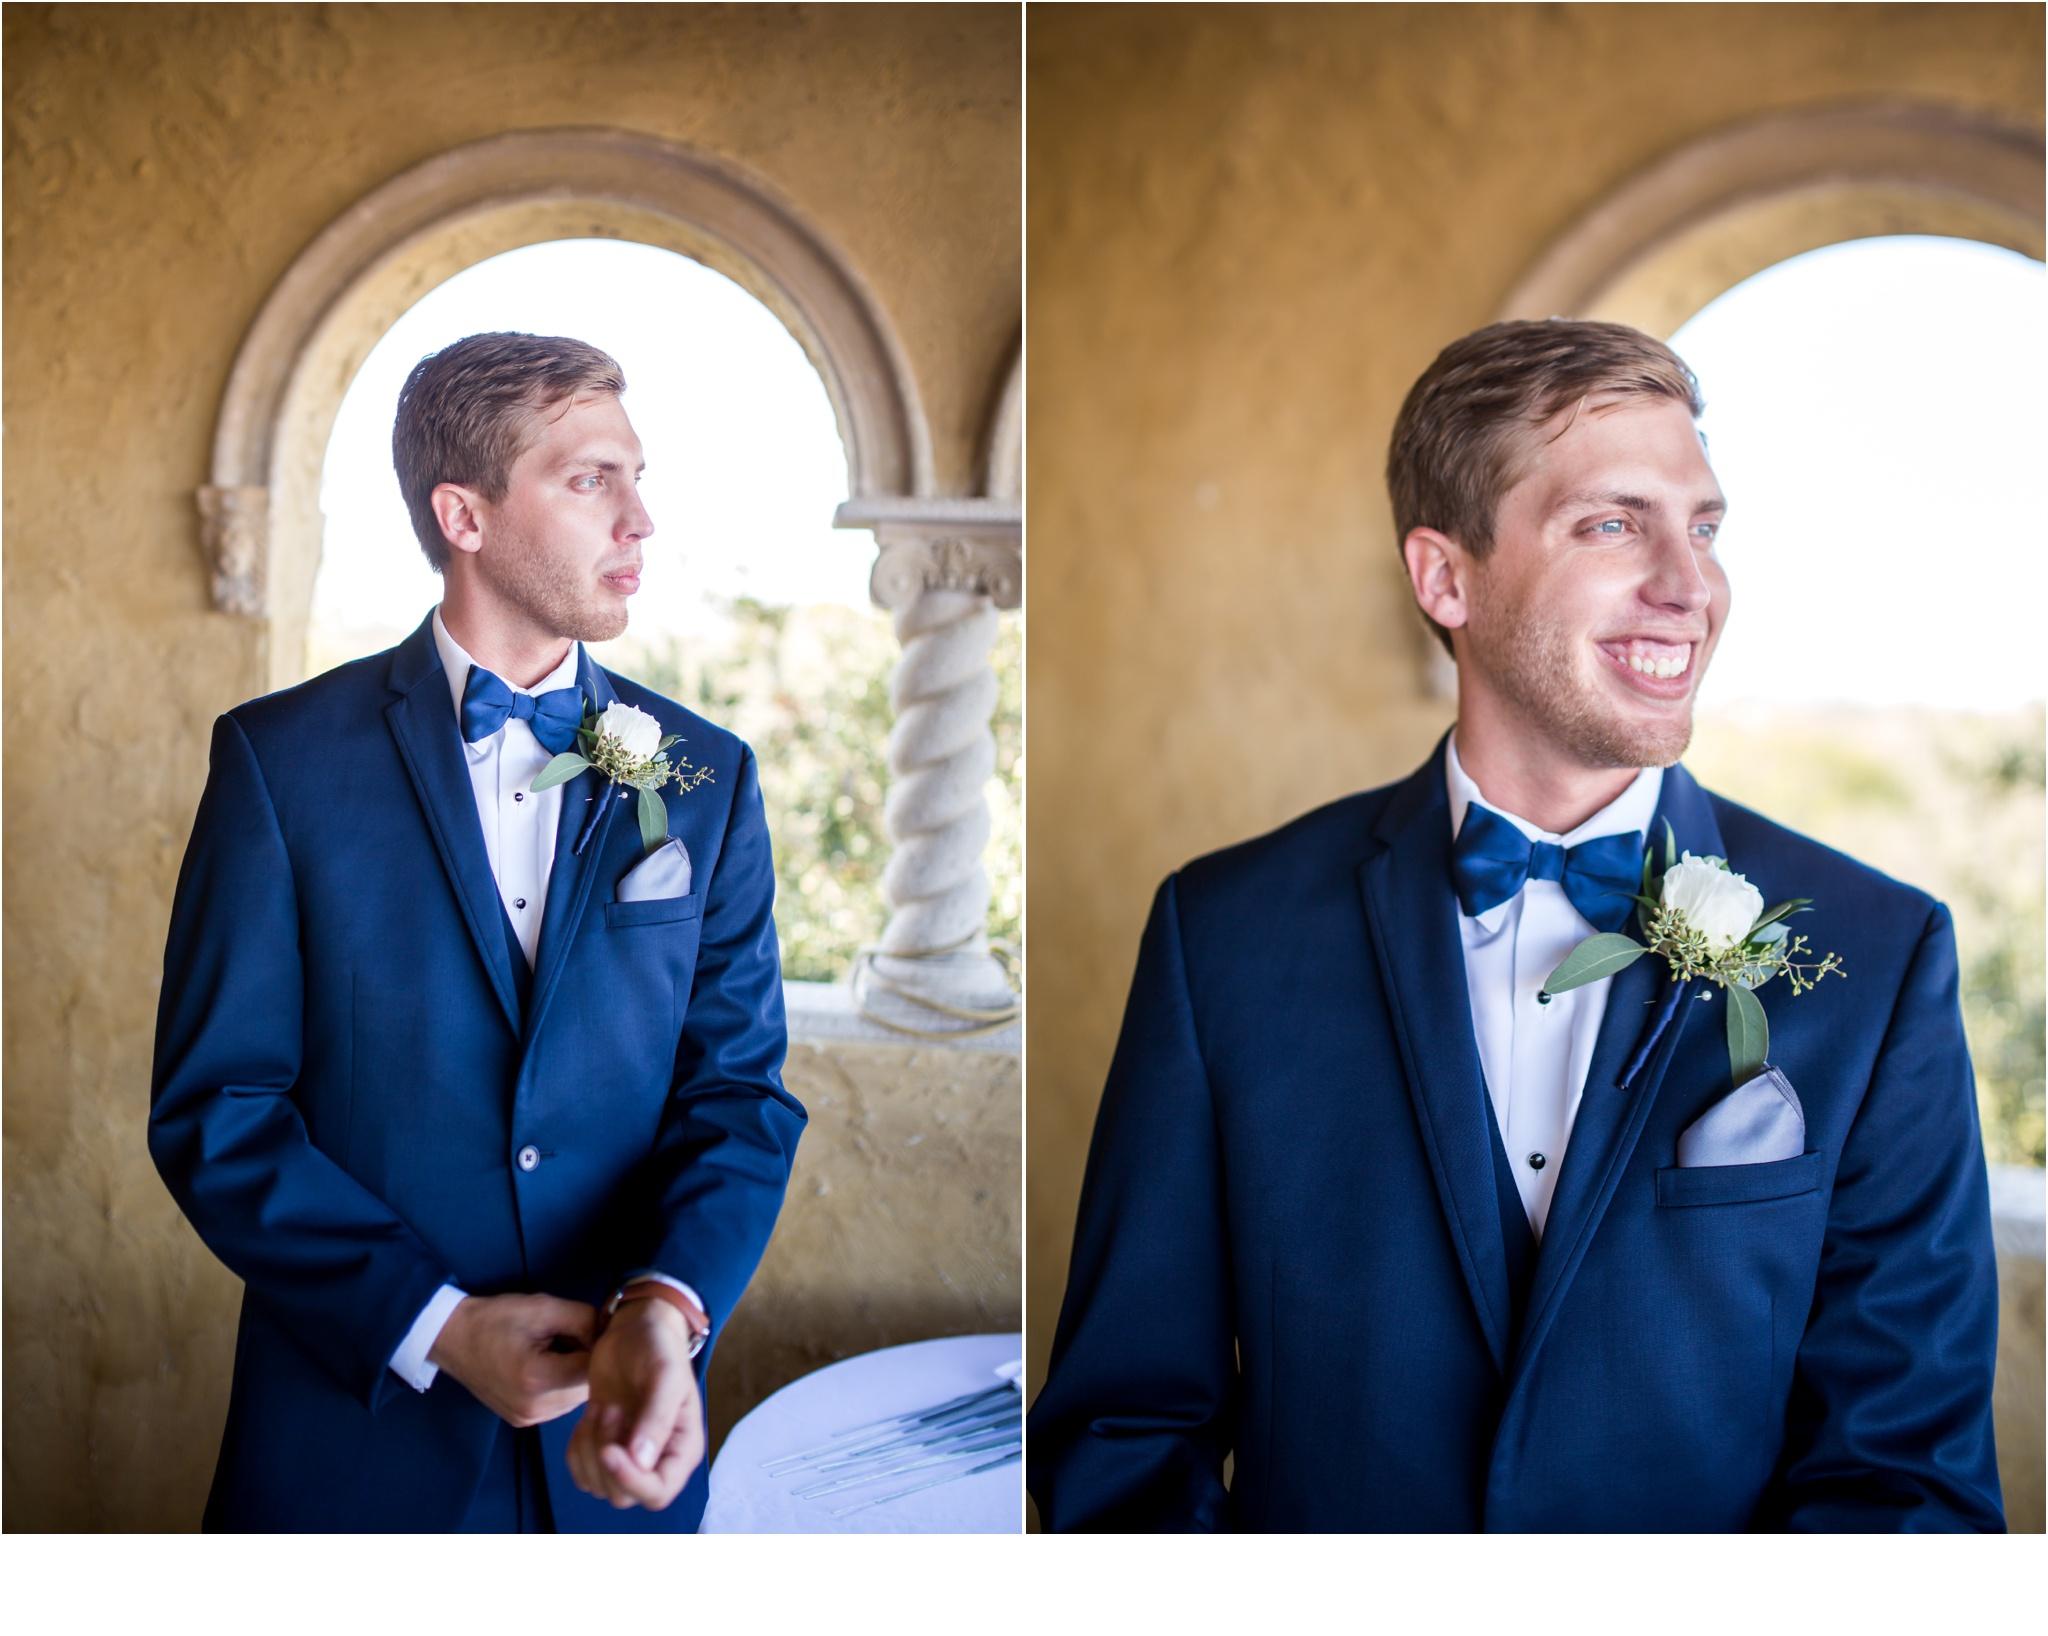 Rainey_Gregg_Photography_St._Simons_Island_Georgia_California_Wedding_Portrait_Photography_0628.jpg